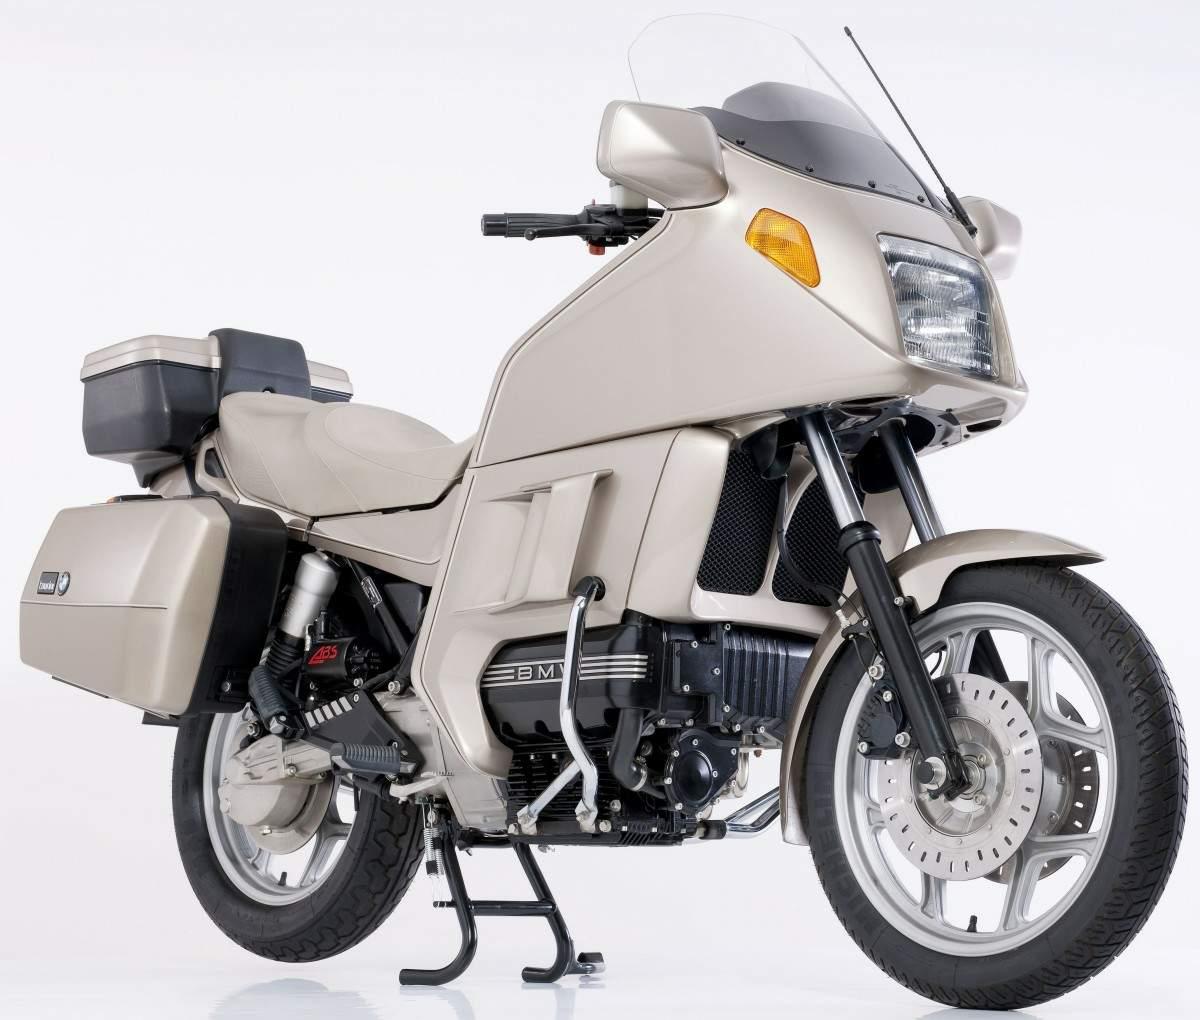 Bmw K100lt Specs: BMW K 100 LT Specs